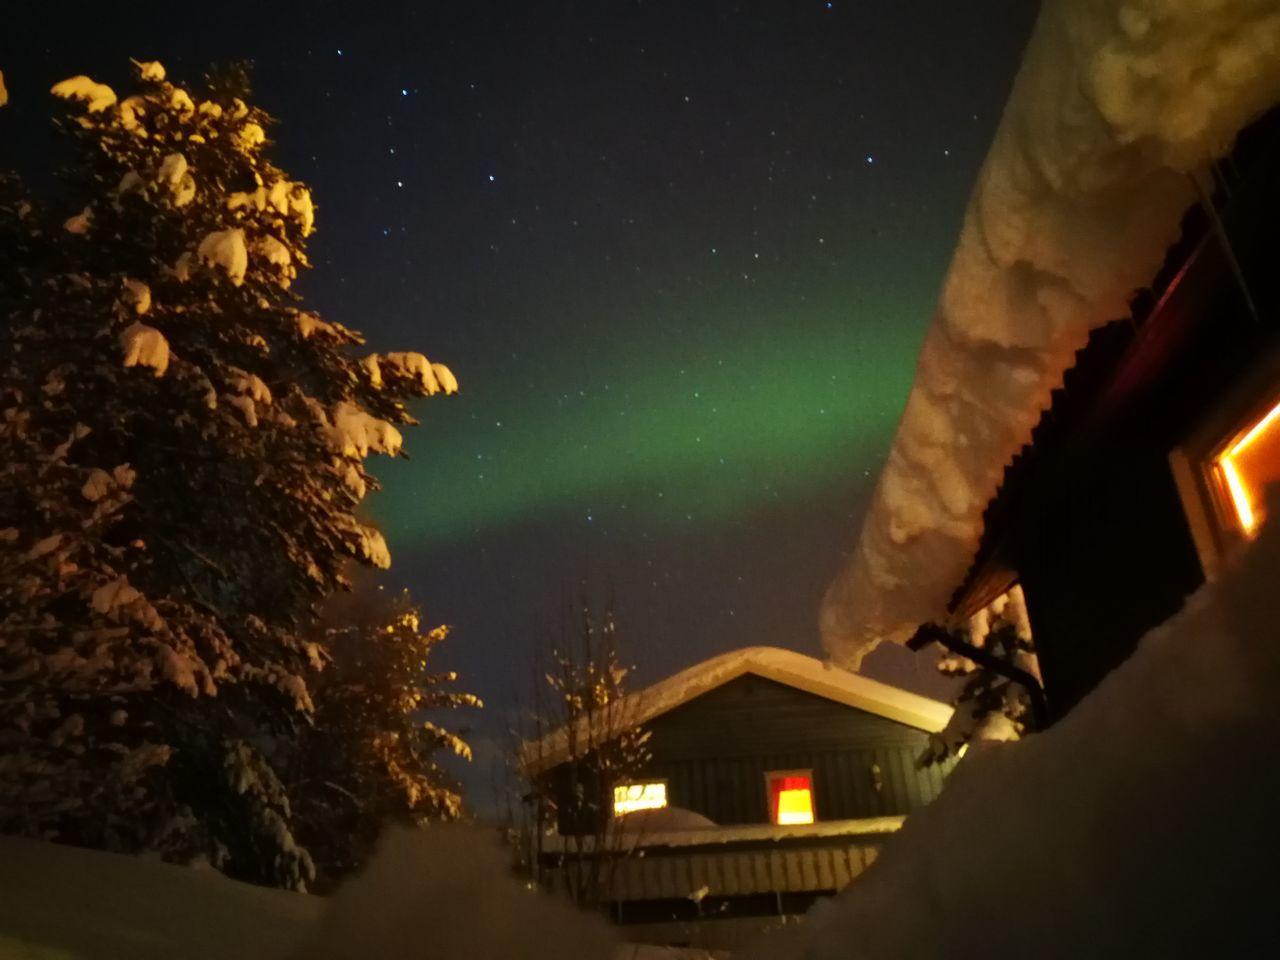 Aurora Borealis Space NatureSky No People Outdoors Winter Night Stars